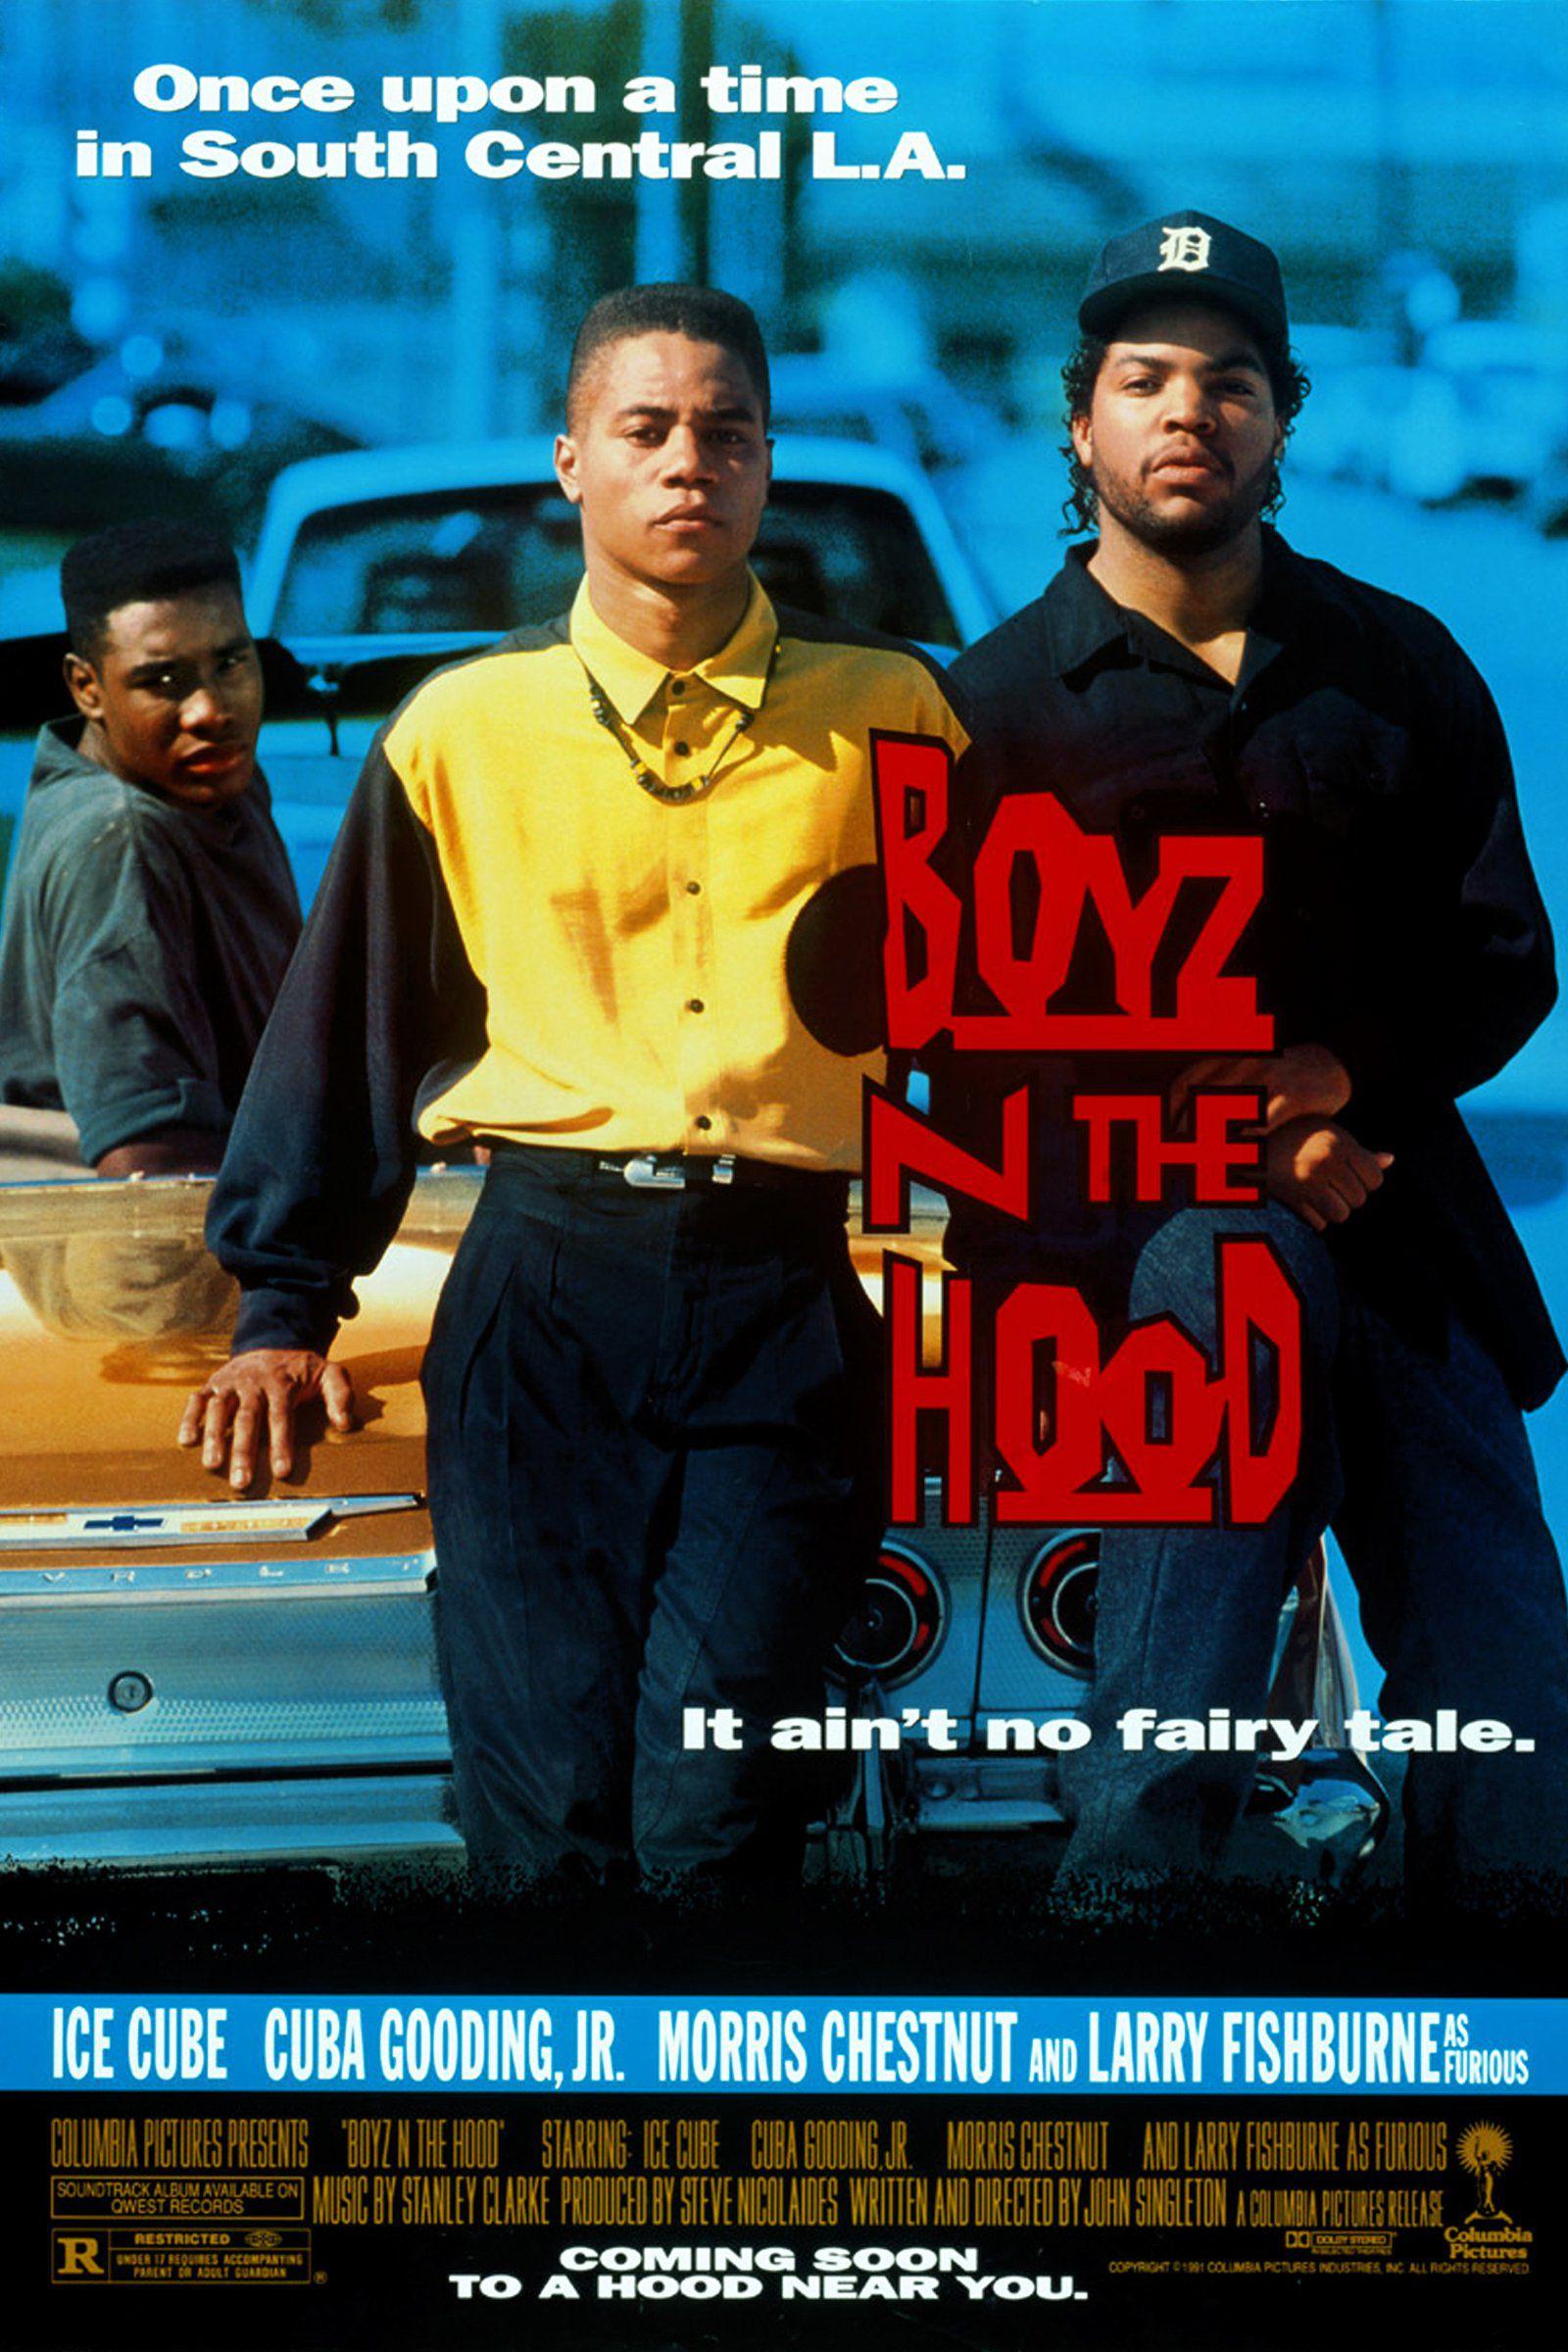 Boyz'n the hood (1991) de John Singleton